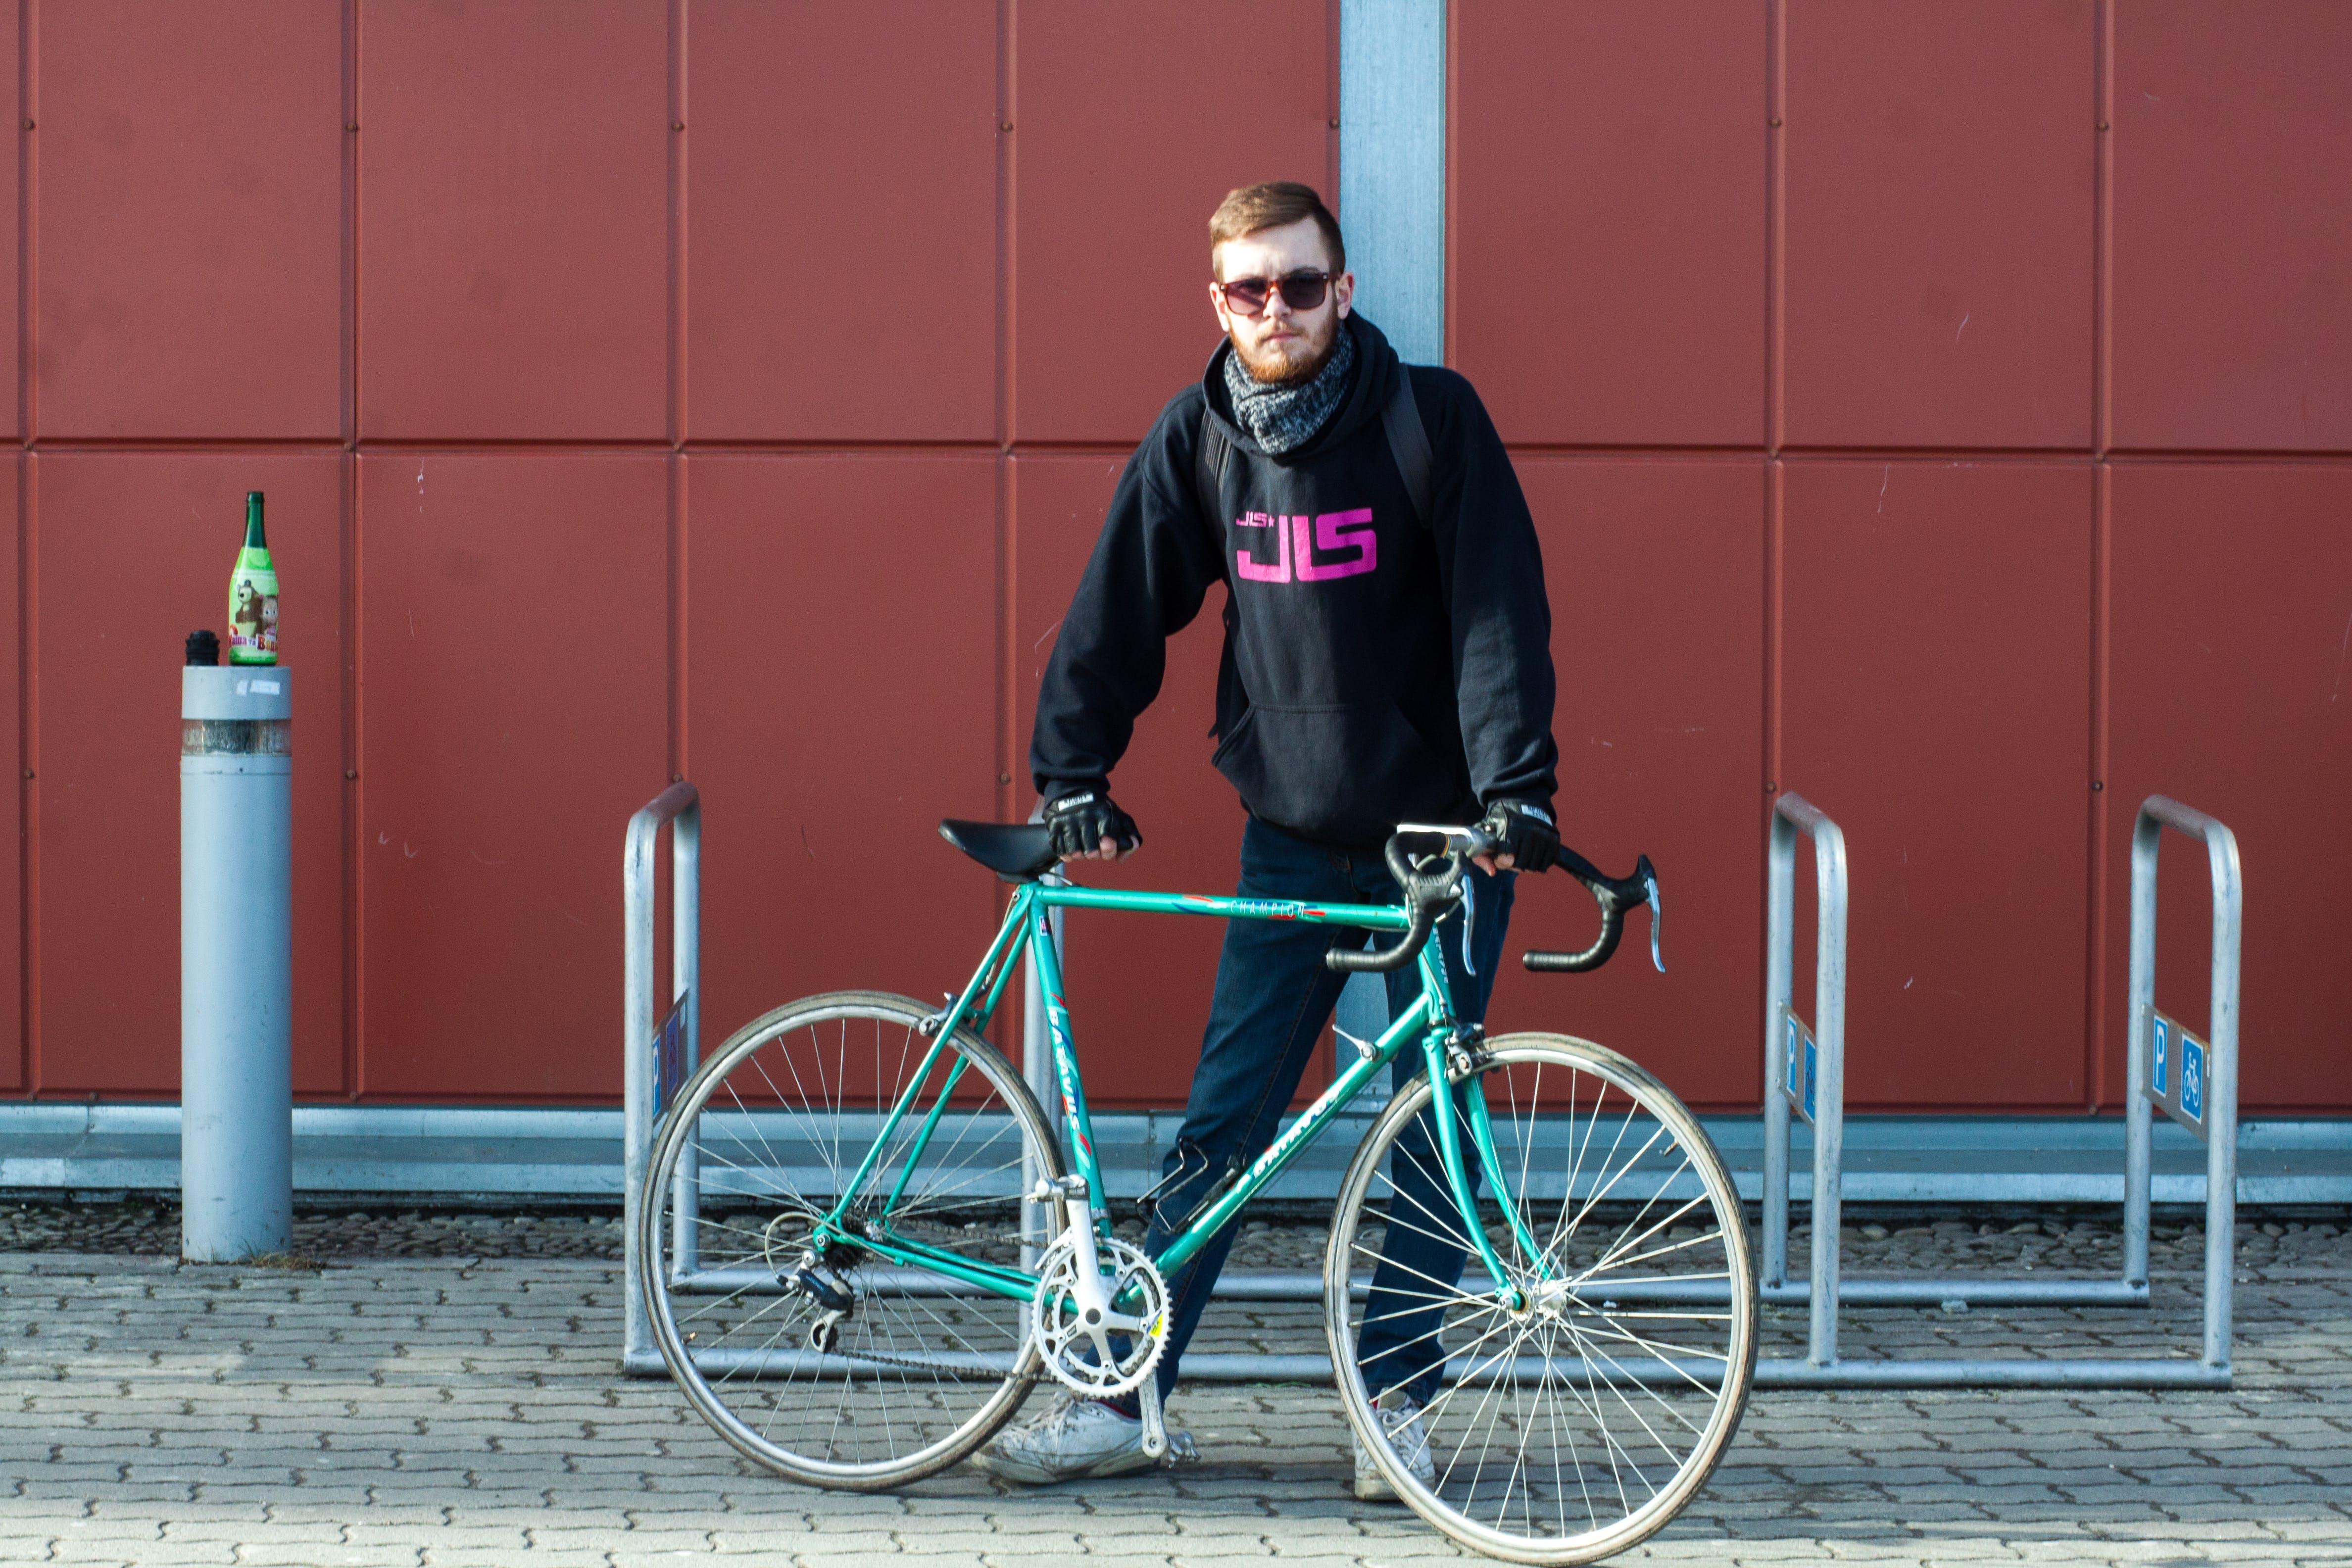 Person In Black Hoodie Holding Green Bike